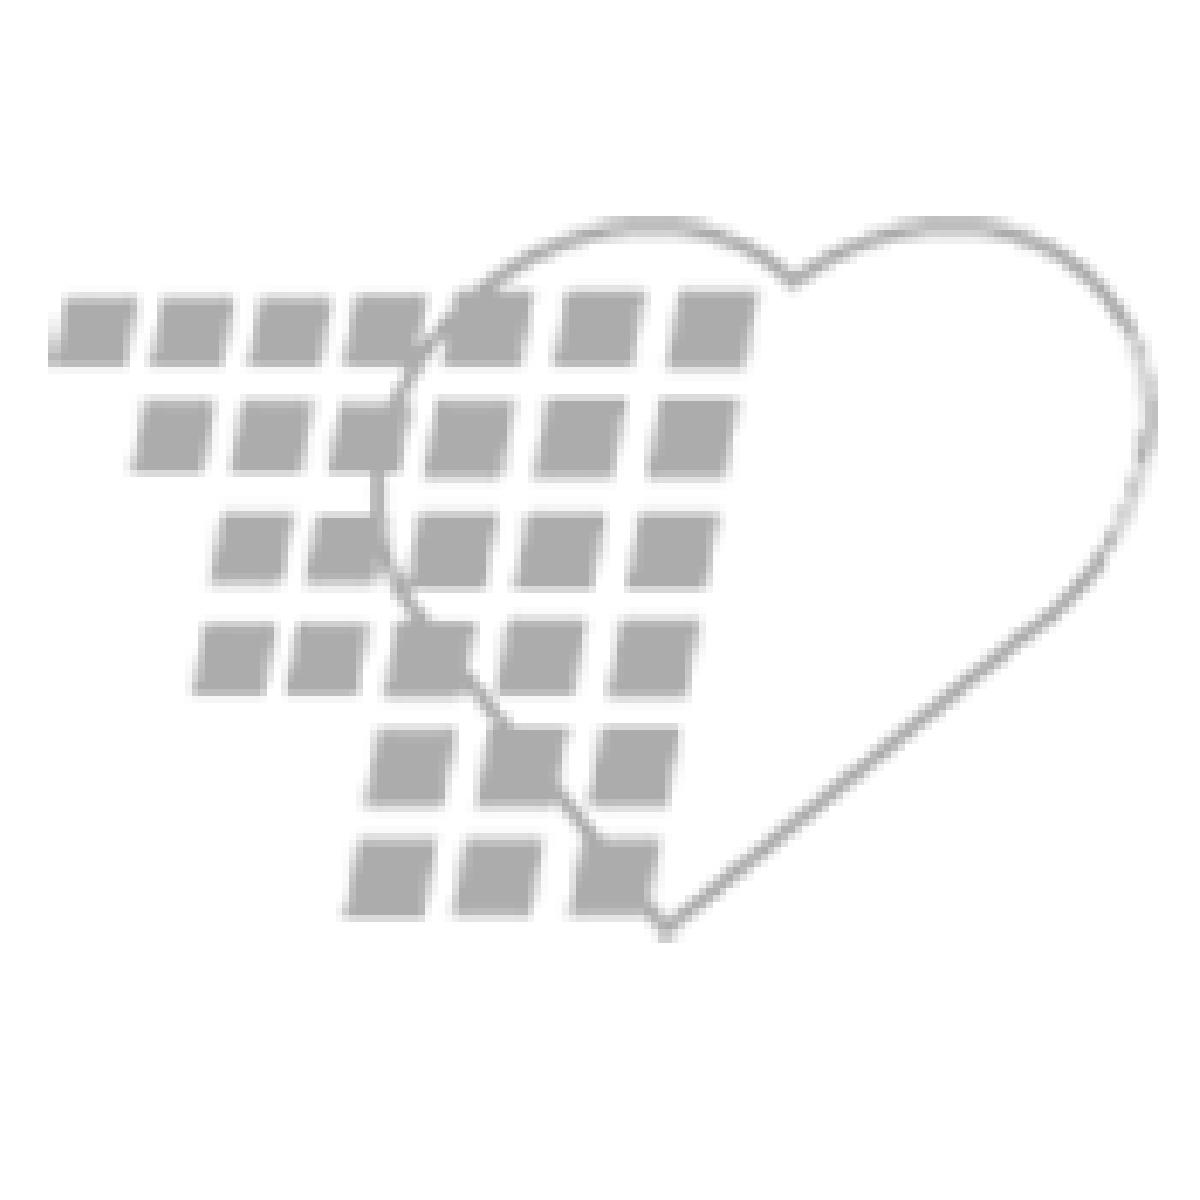 06-93-6104 - Demo Dose® Simulated FFP AB Rh Positive